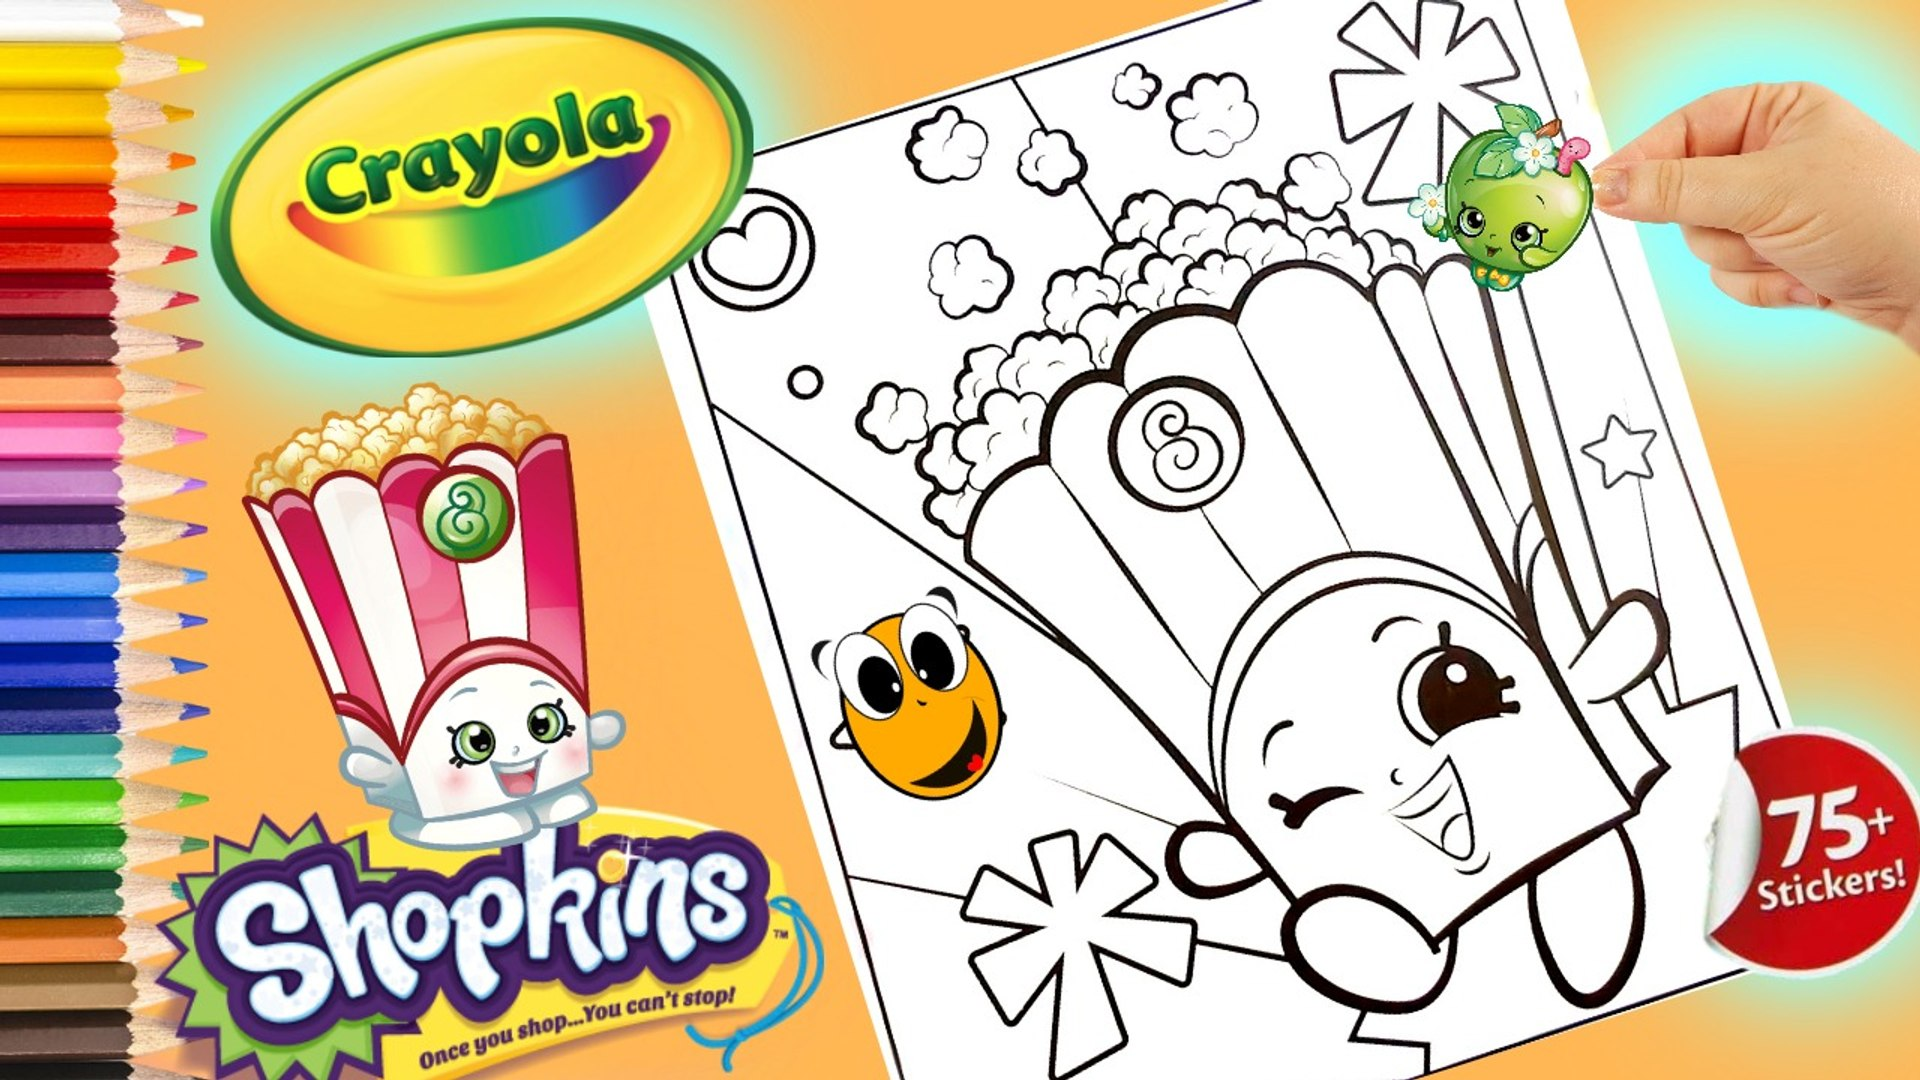 Coloring Shopkins Poppy Corn Crayola Coloring Book Page Colored